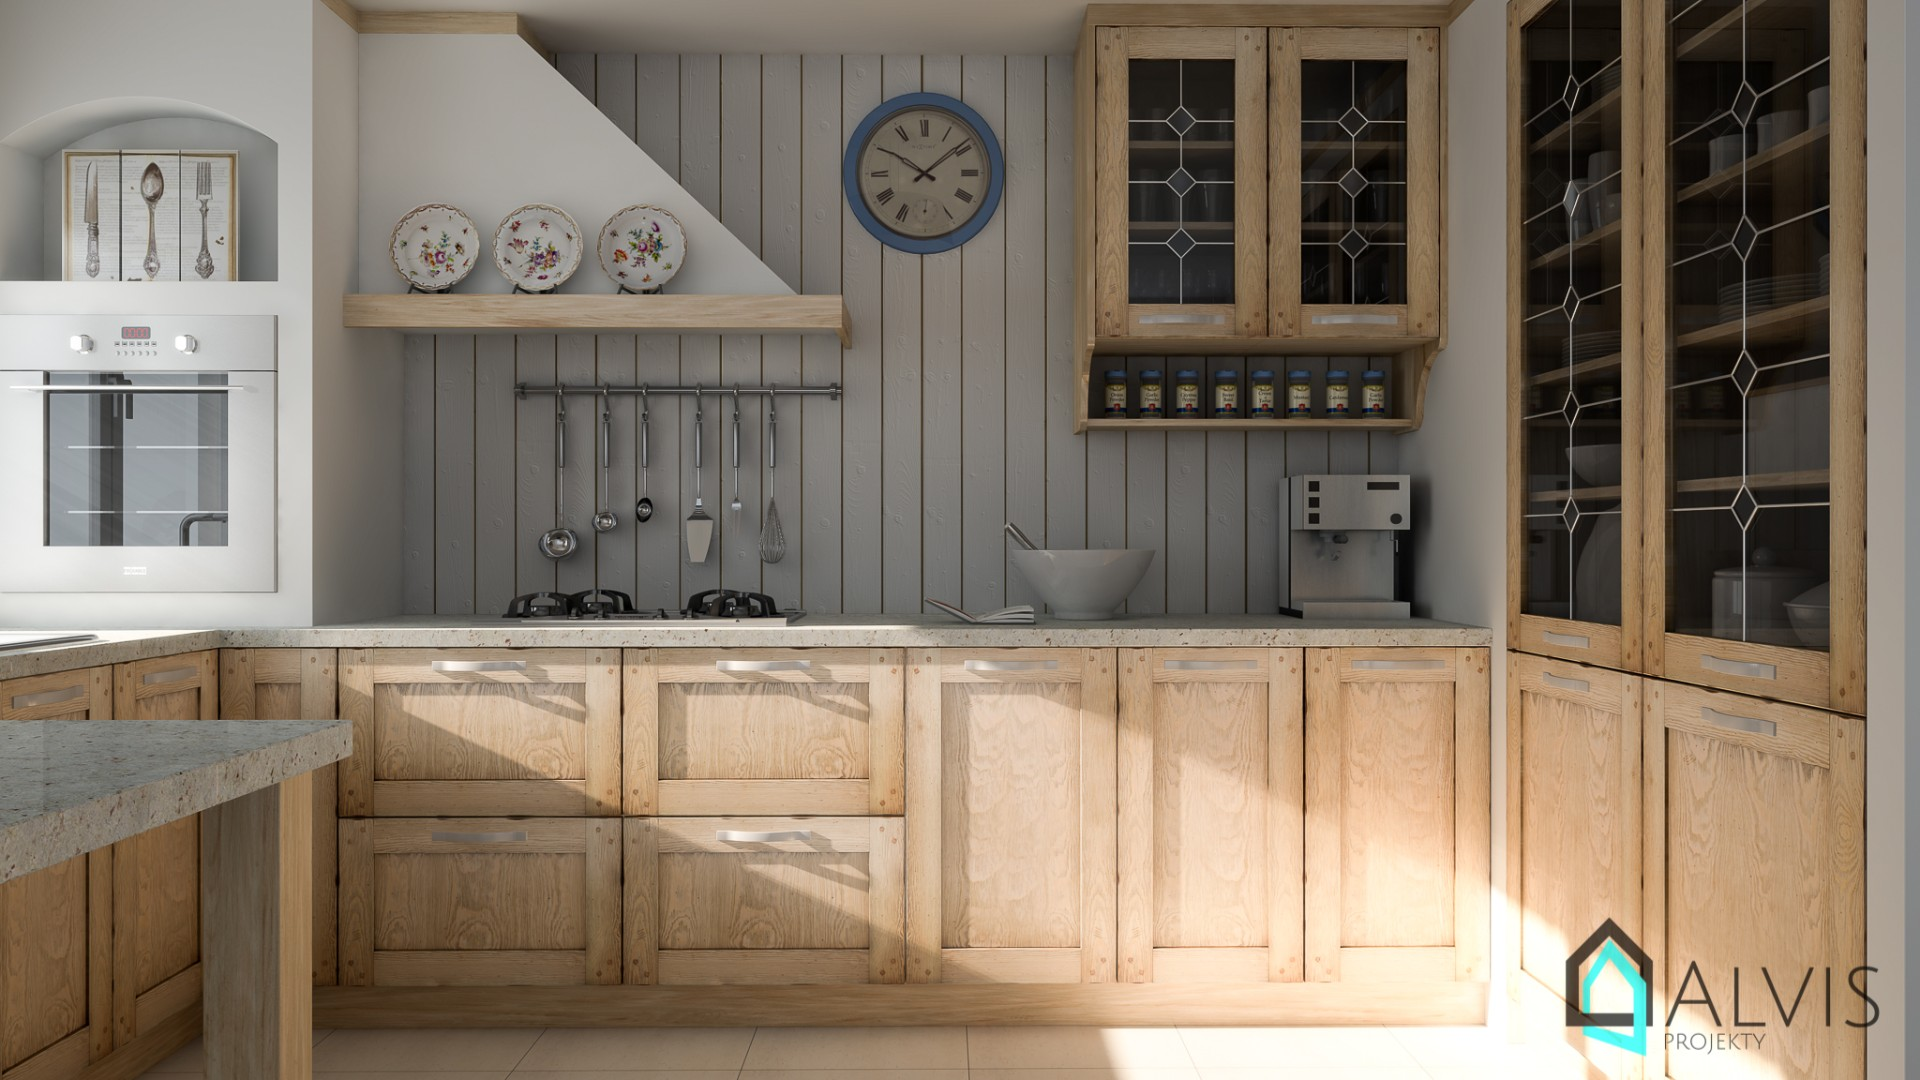 projekty-alvis-kuchnia-sosna-3-of-5-20170530.jpg